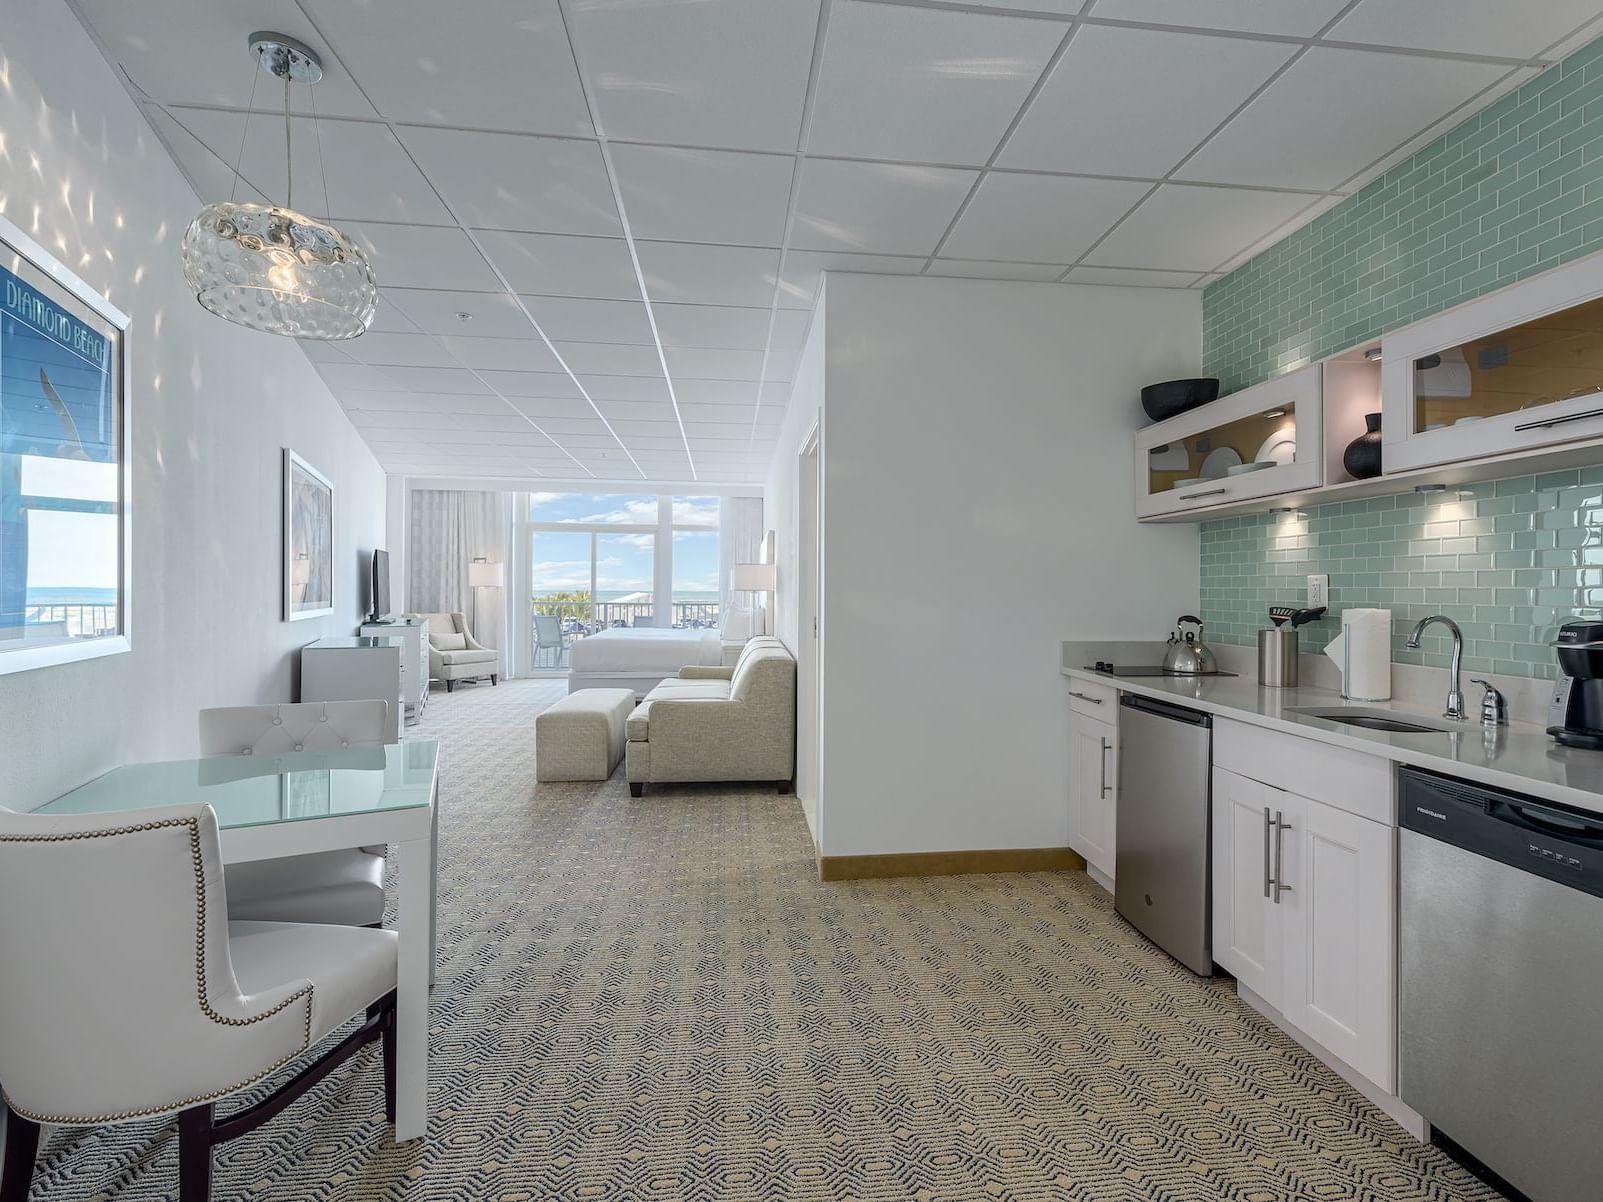 Premium Poolside King Studio Beachfront Hotel Room in the Wildwood NJ